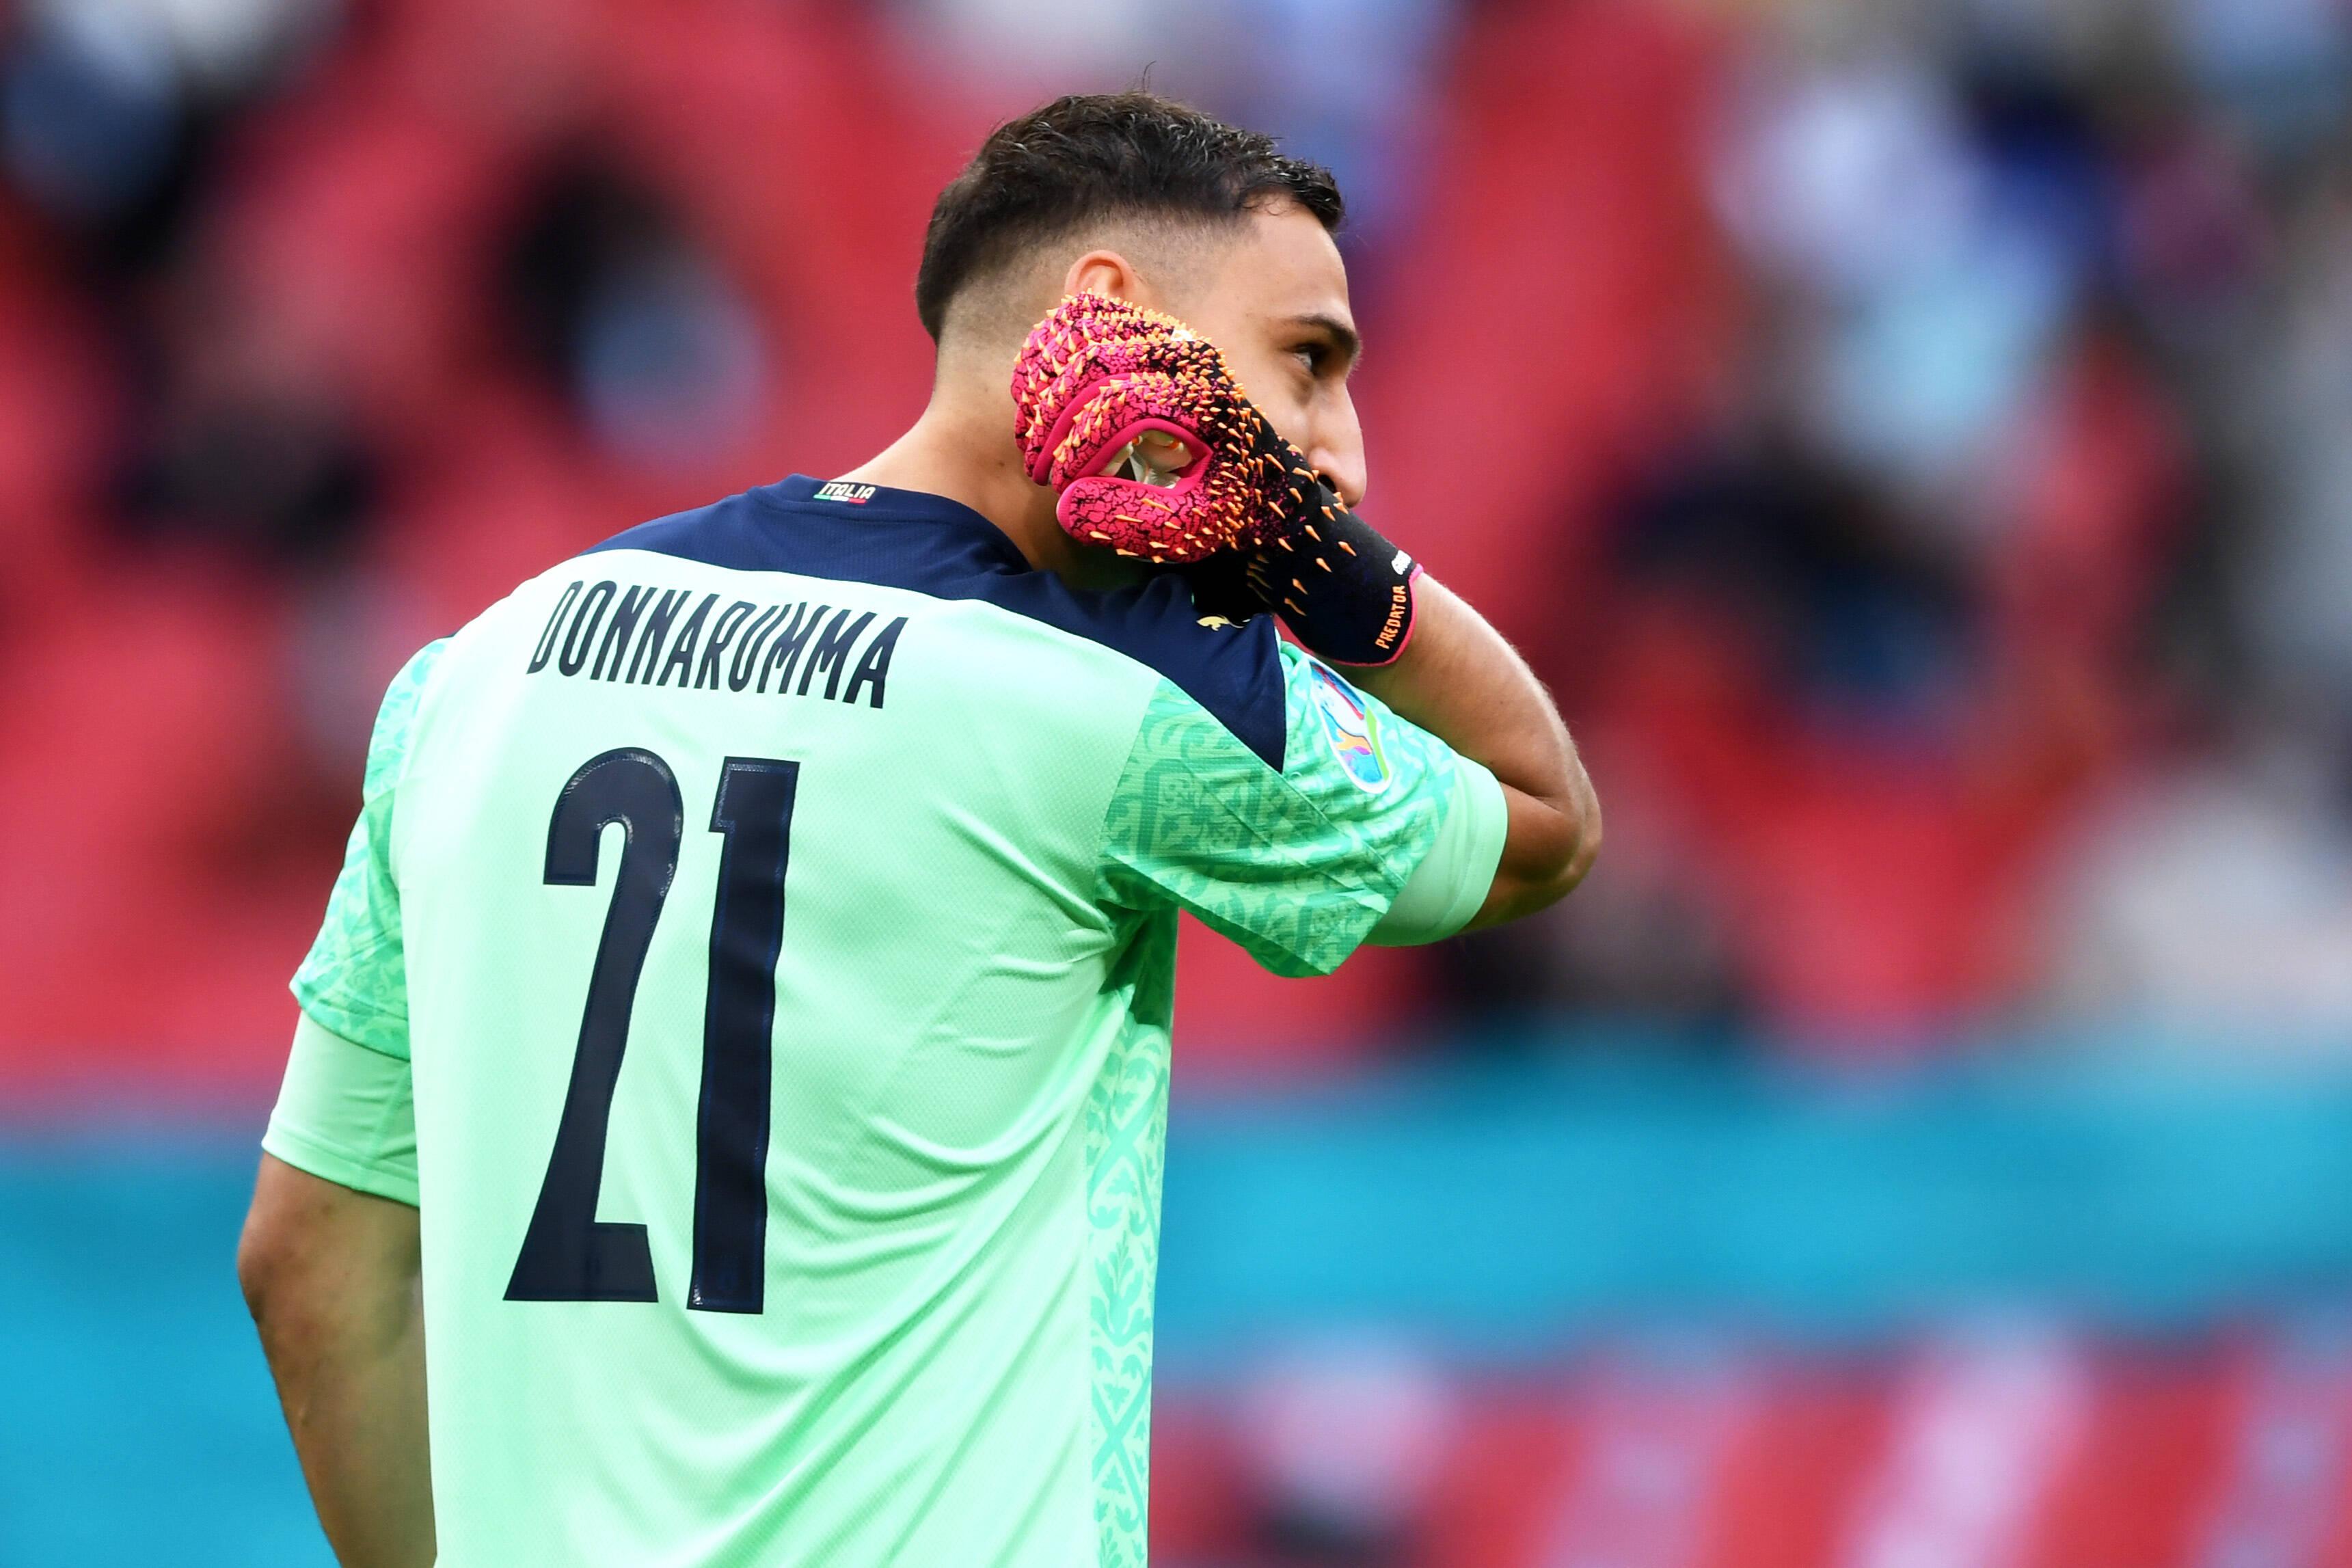 Italian Media Explains Why PSG Hasn't Announced Donnarumma Transfer